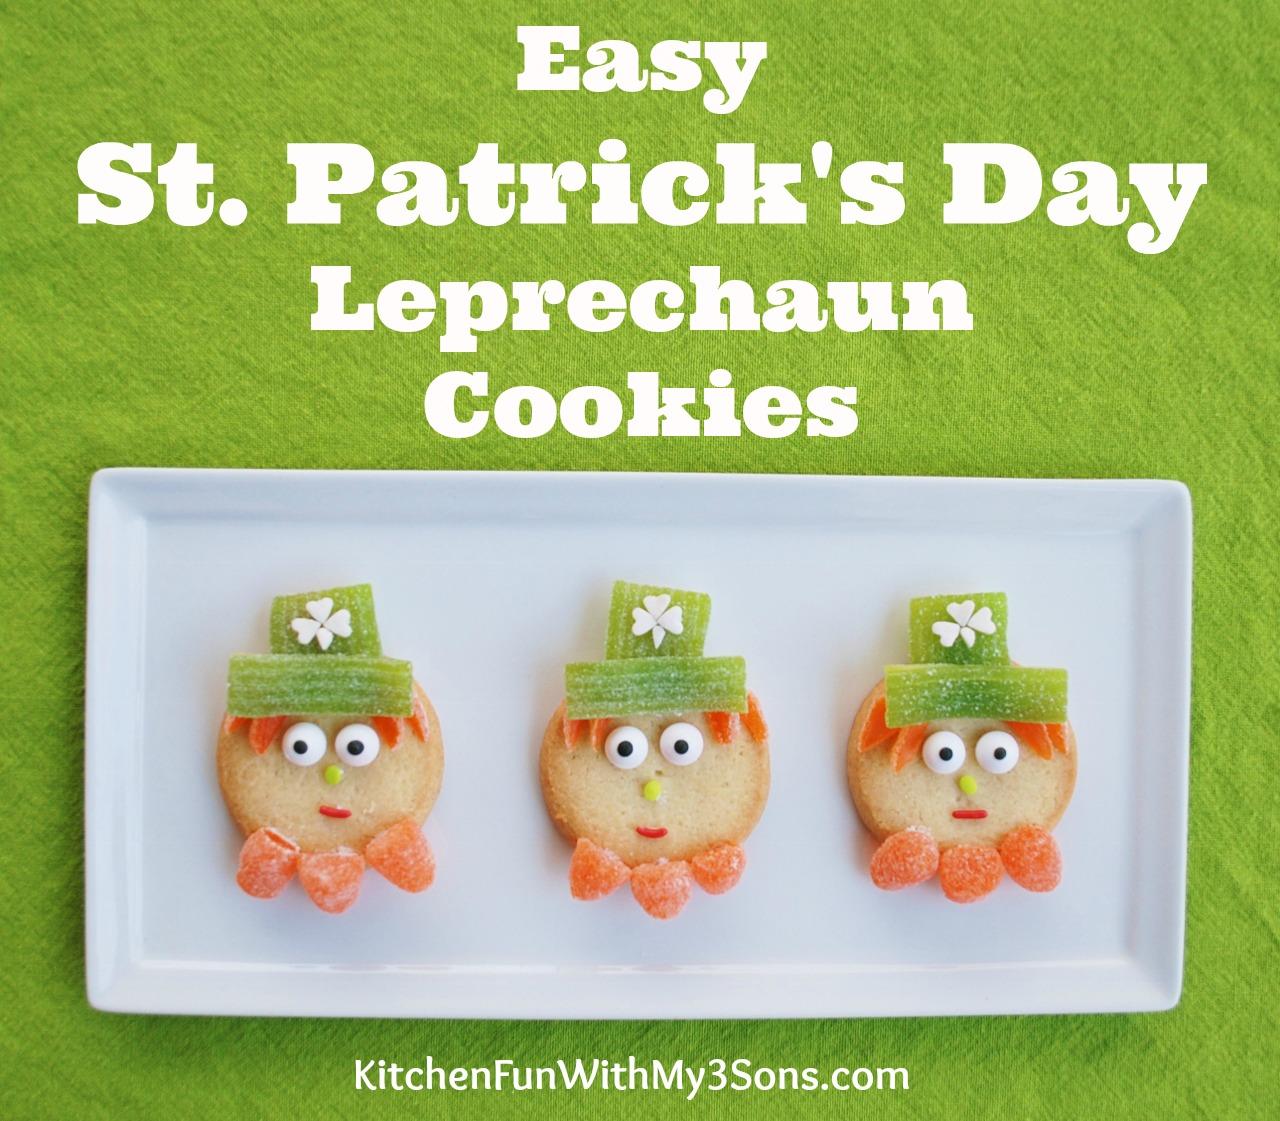 St Patrick S Day Breakfast She Brooke: Super Easy St. Patrick's Day Leprechaun Cookies